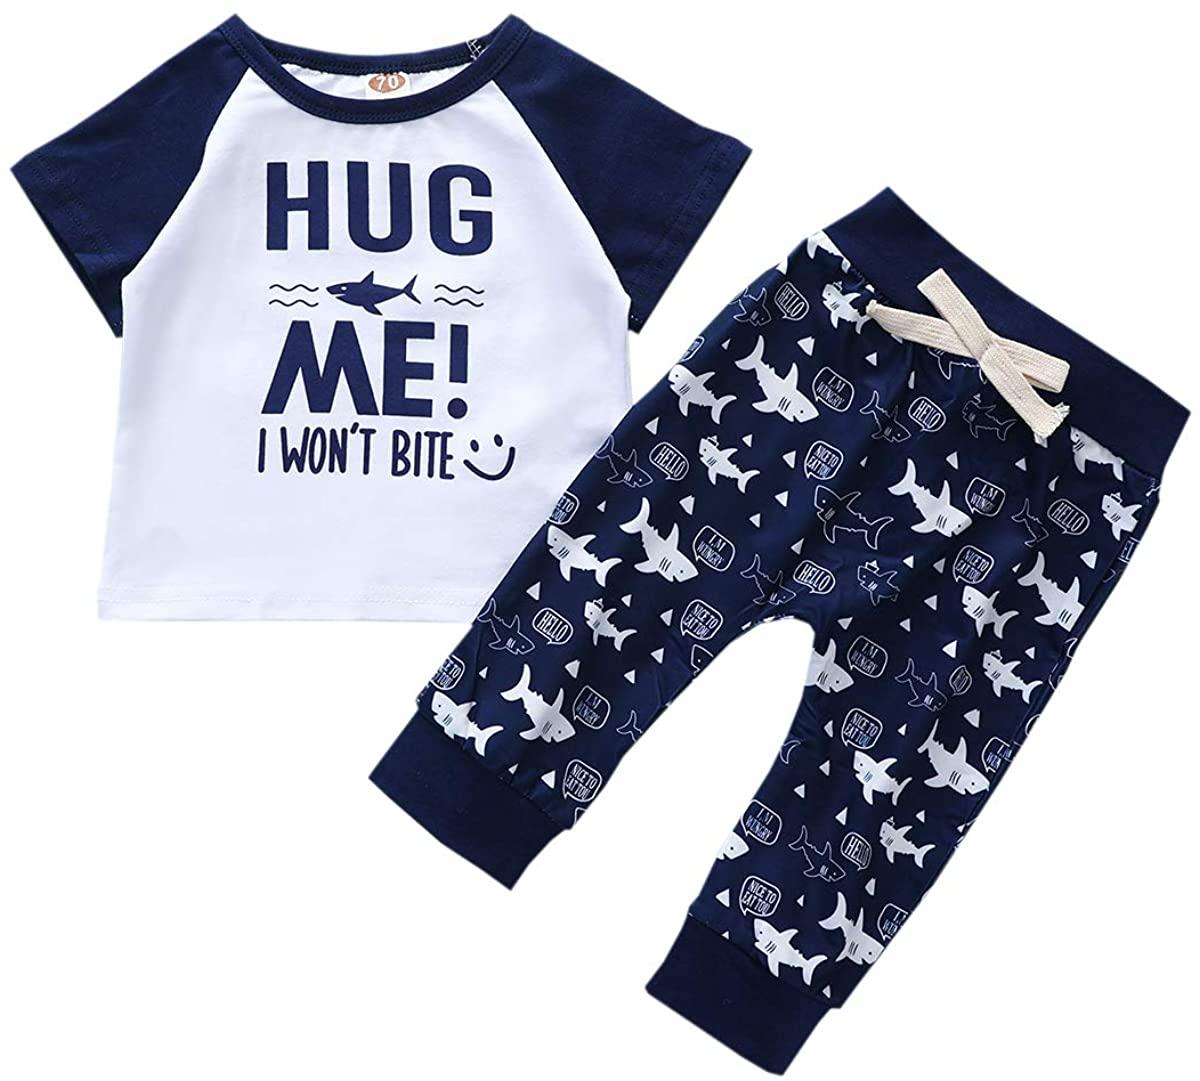 Toddler Baby Boy Pants Set Cute Short Sleeve Tops Pants 2Pcs Summer Clothes Set